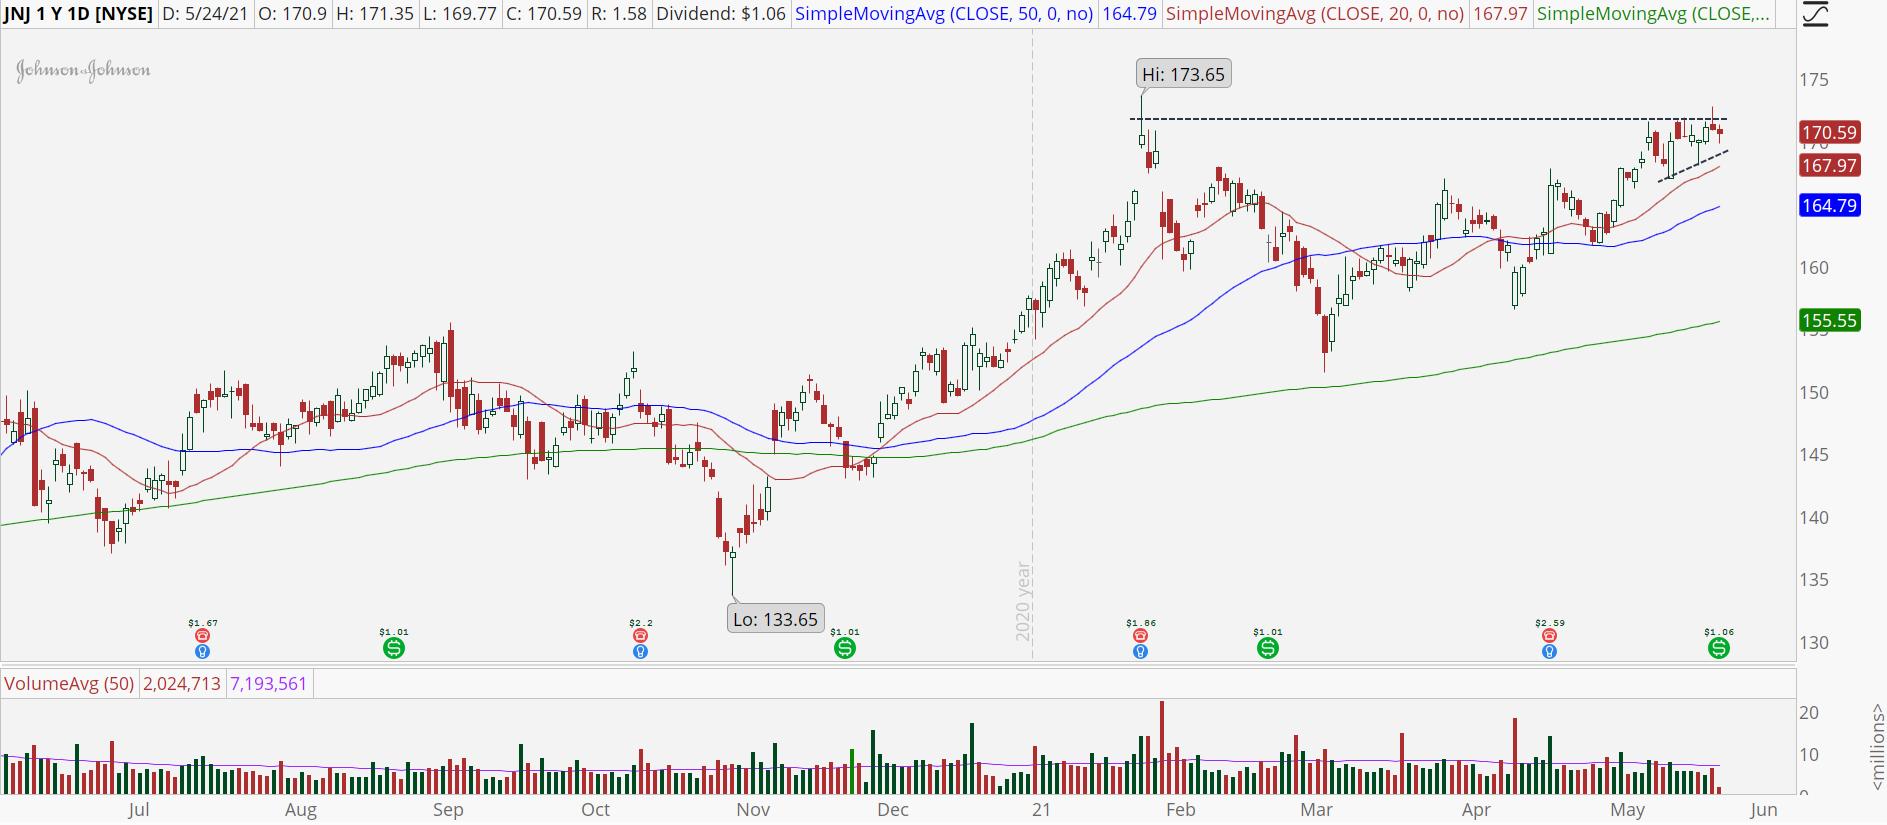 Johnson & Johnson (JNJ) stock chart with ascending triangle breakout